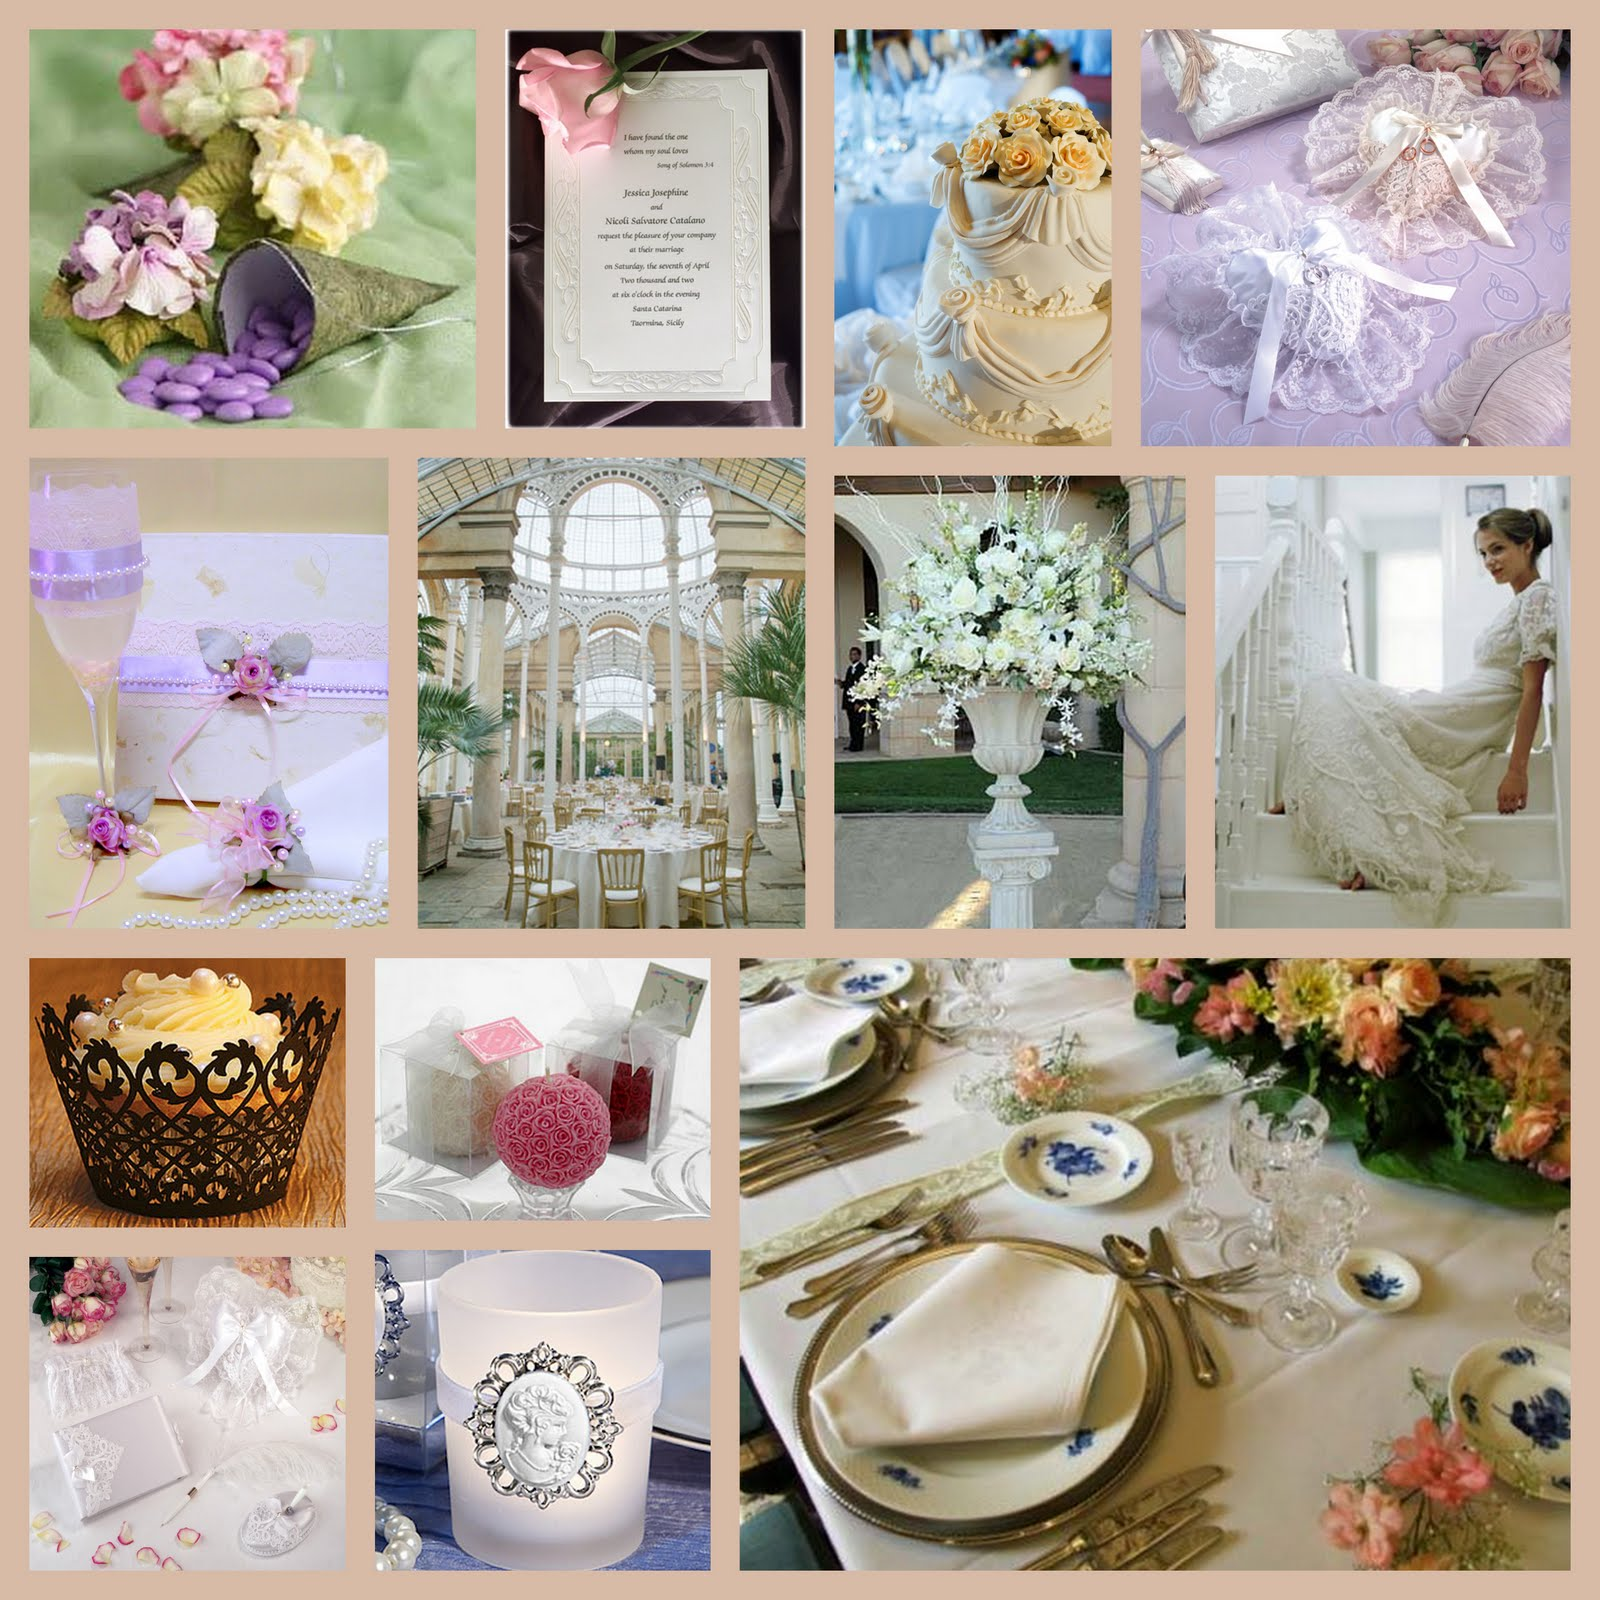 Premier Bride Magazine: Texas: Wedding Theme: Victorian Gala